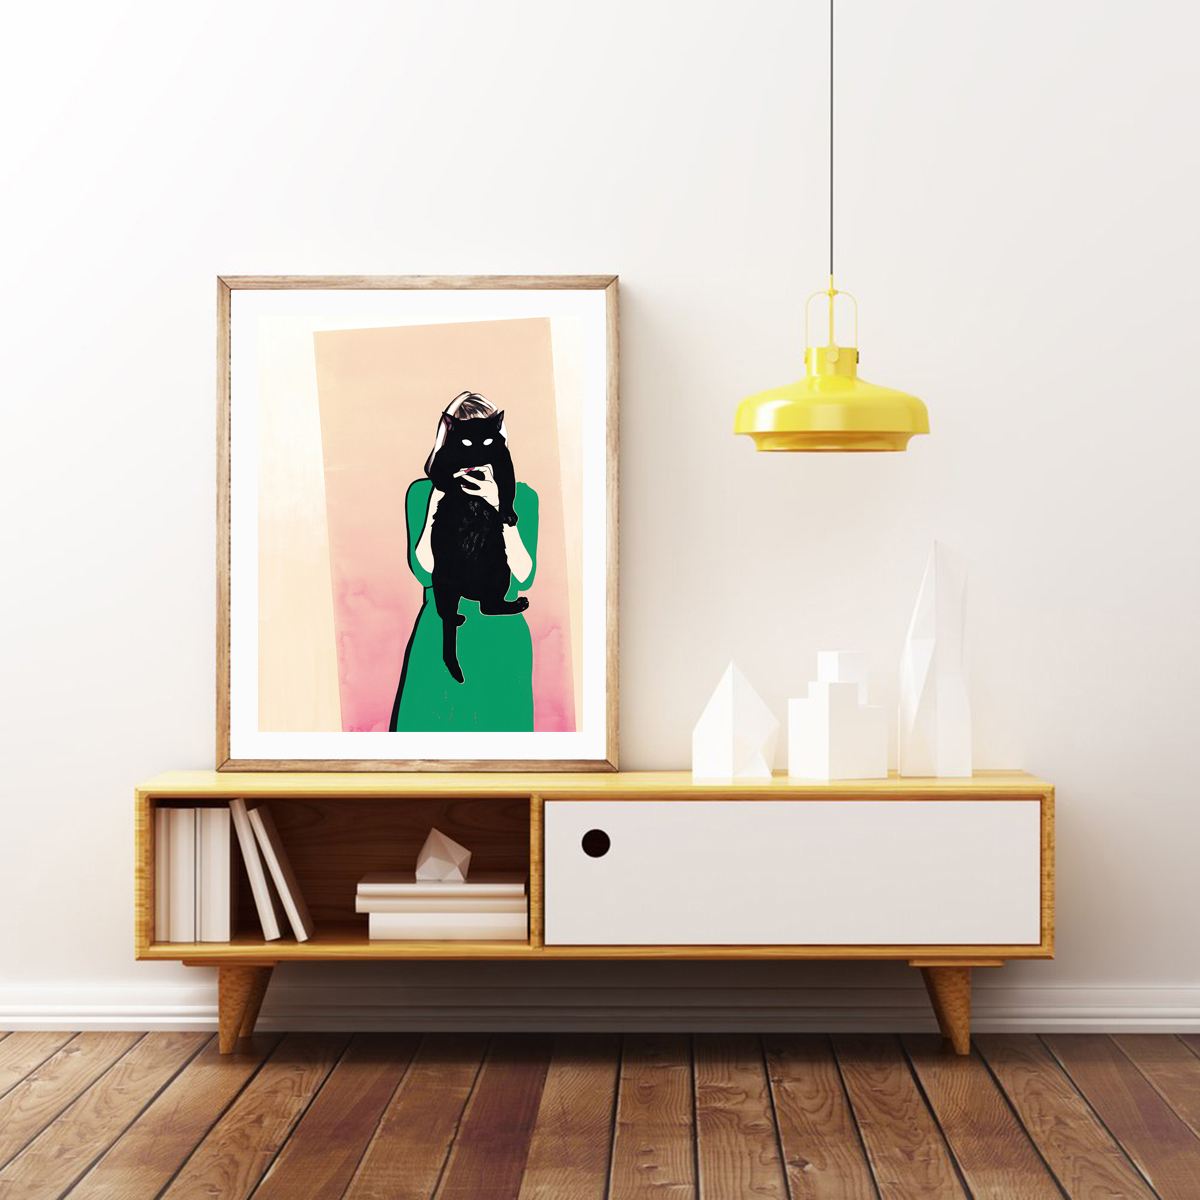 Custom-sized    SEEK    print